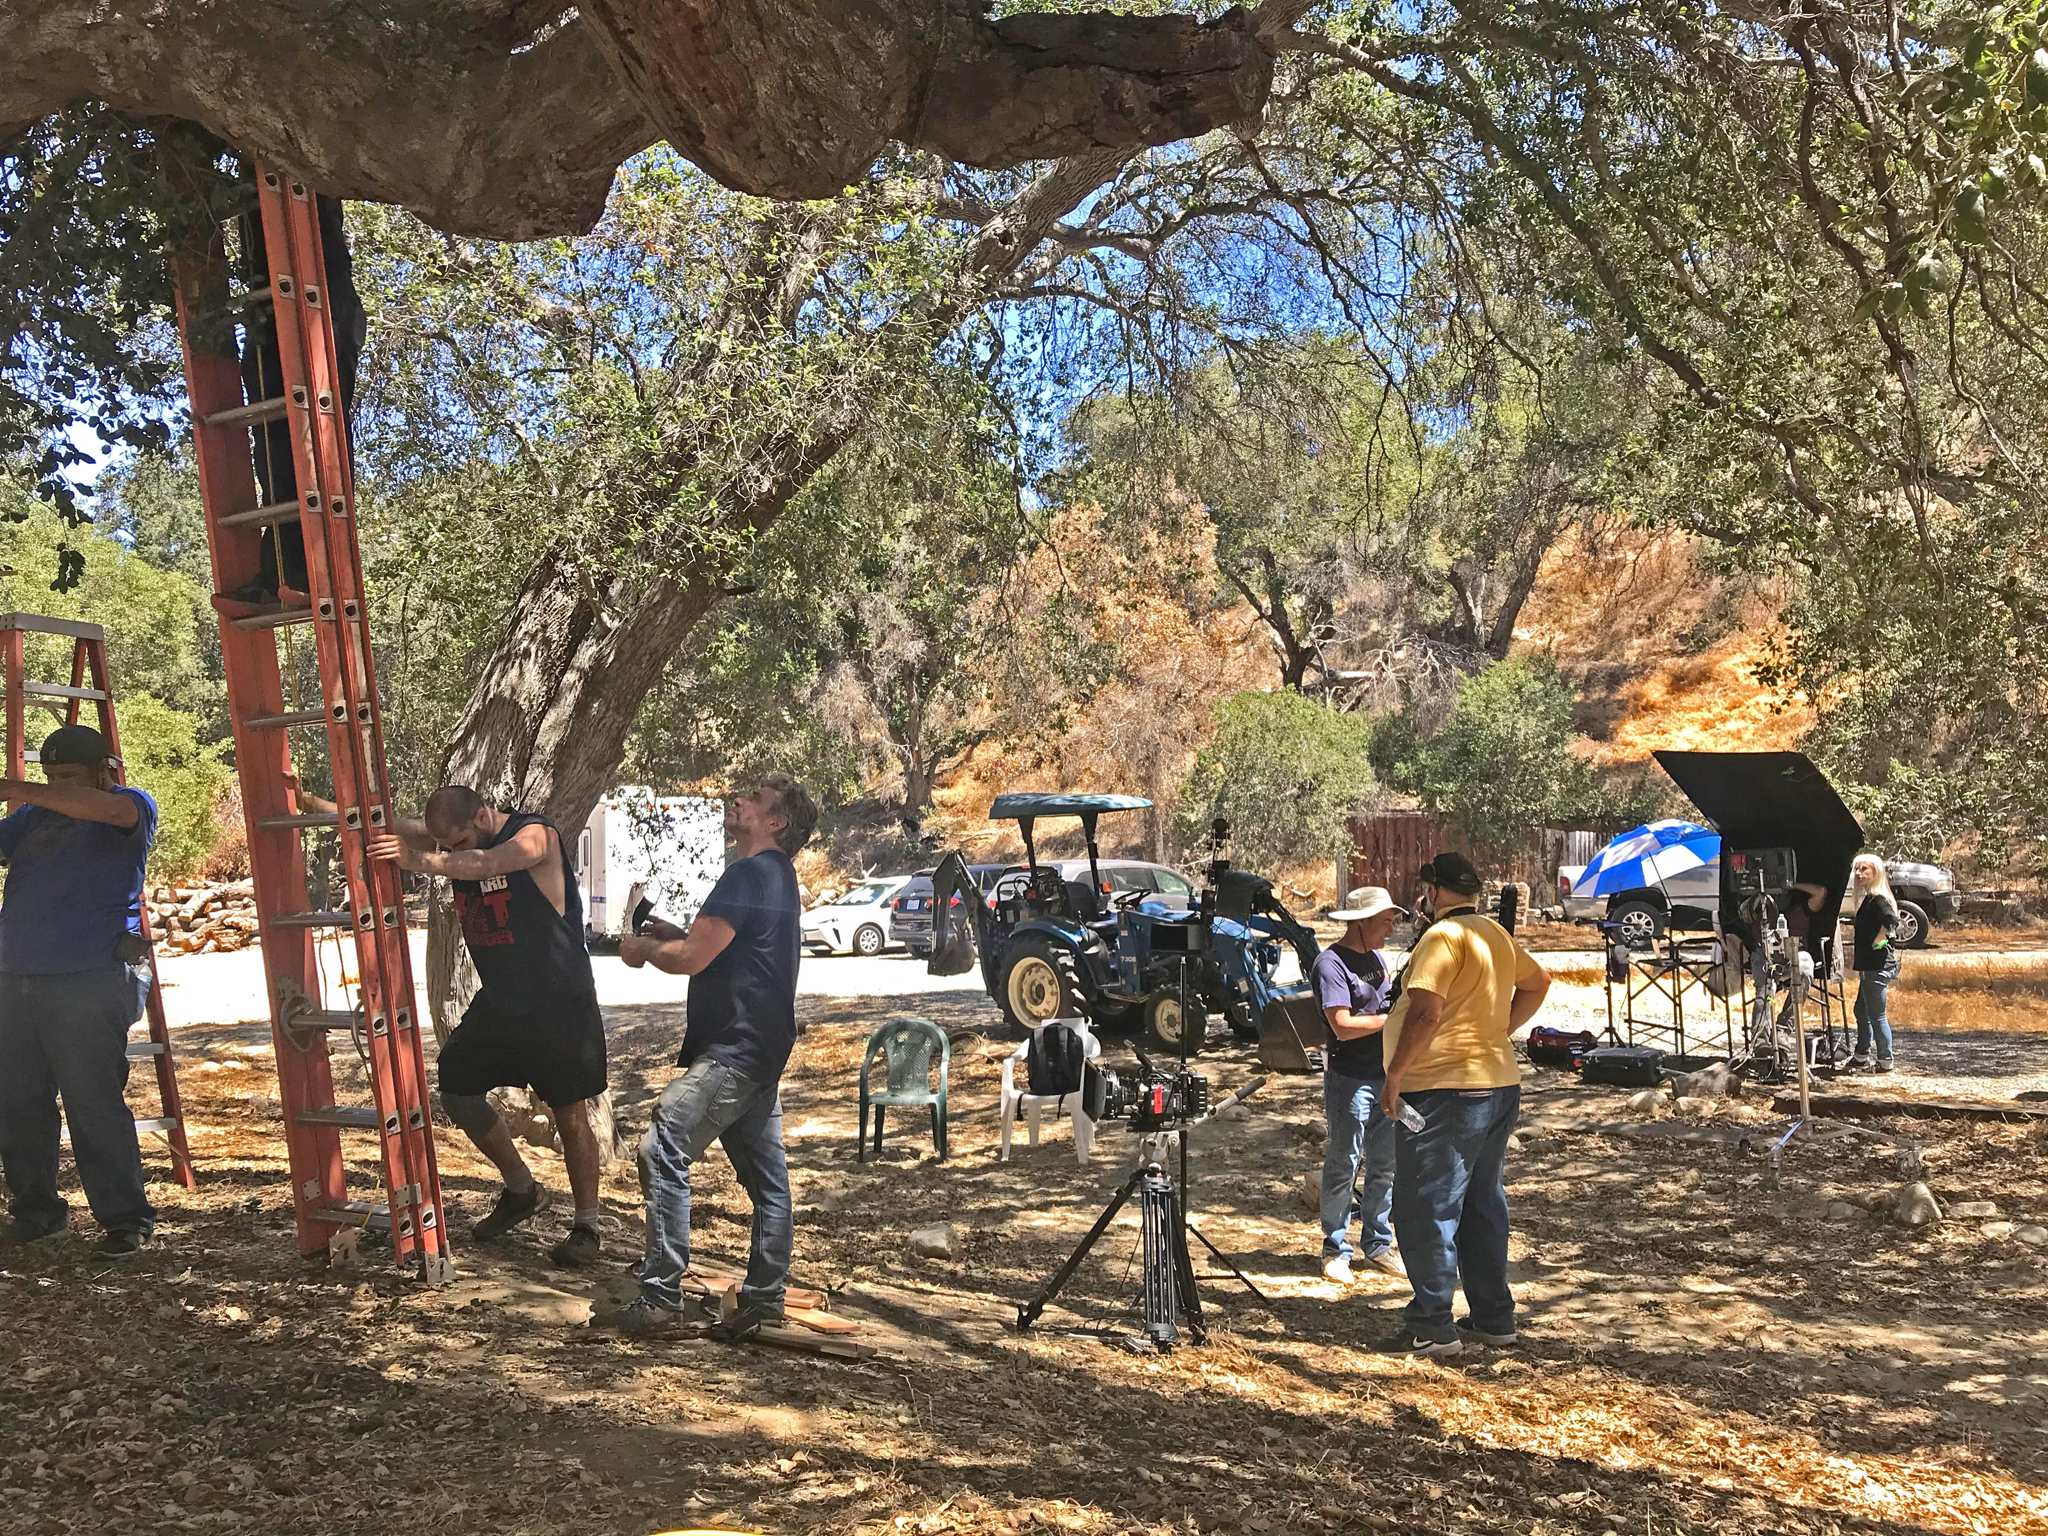 Setting up the treehouse set.